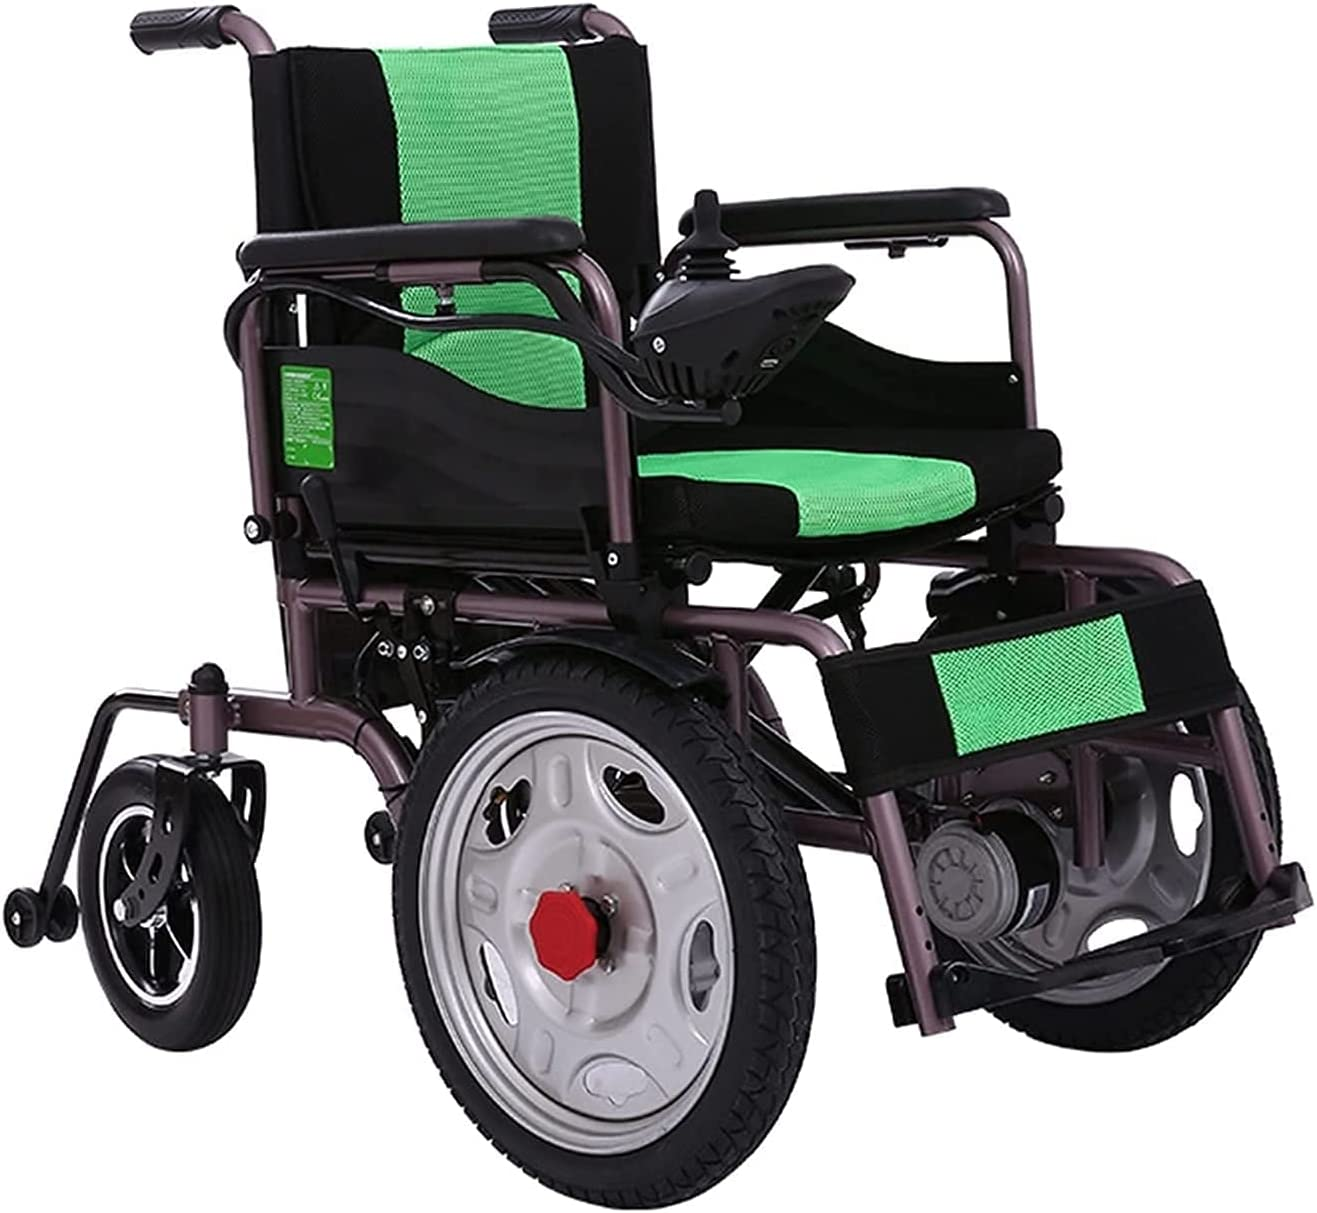 specialty shop Electric Wheelchair Anti-Backward specialty shop Tilting Wheel Safety Portable